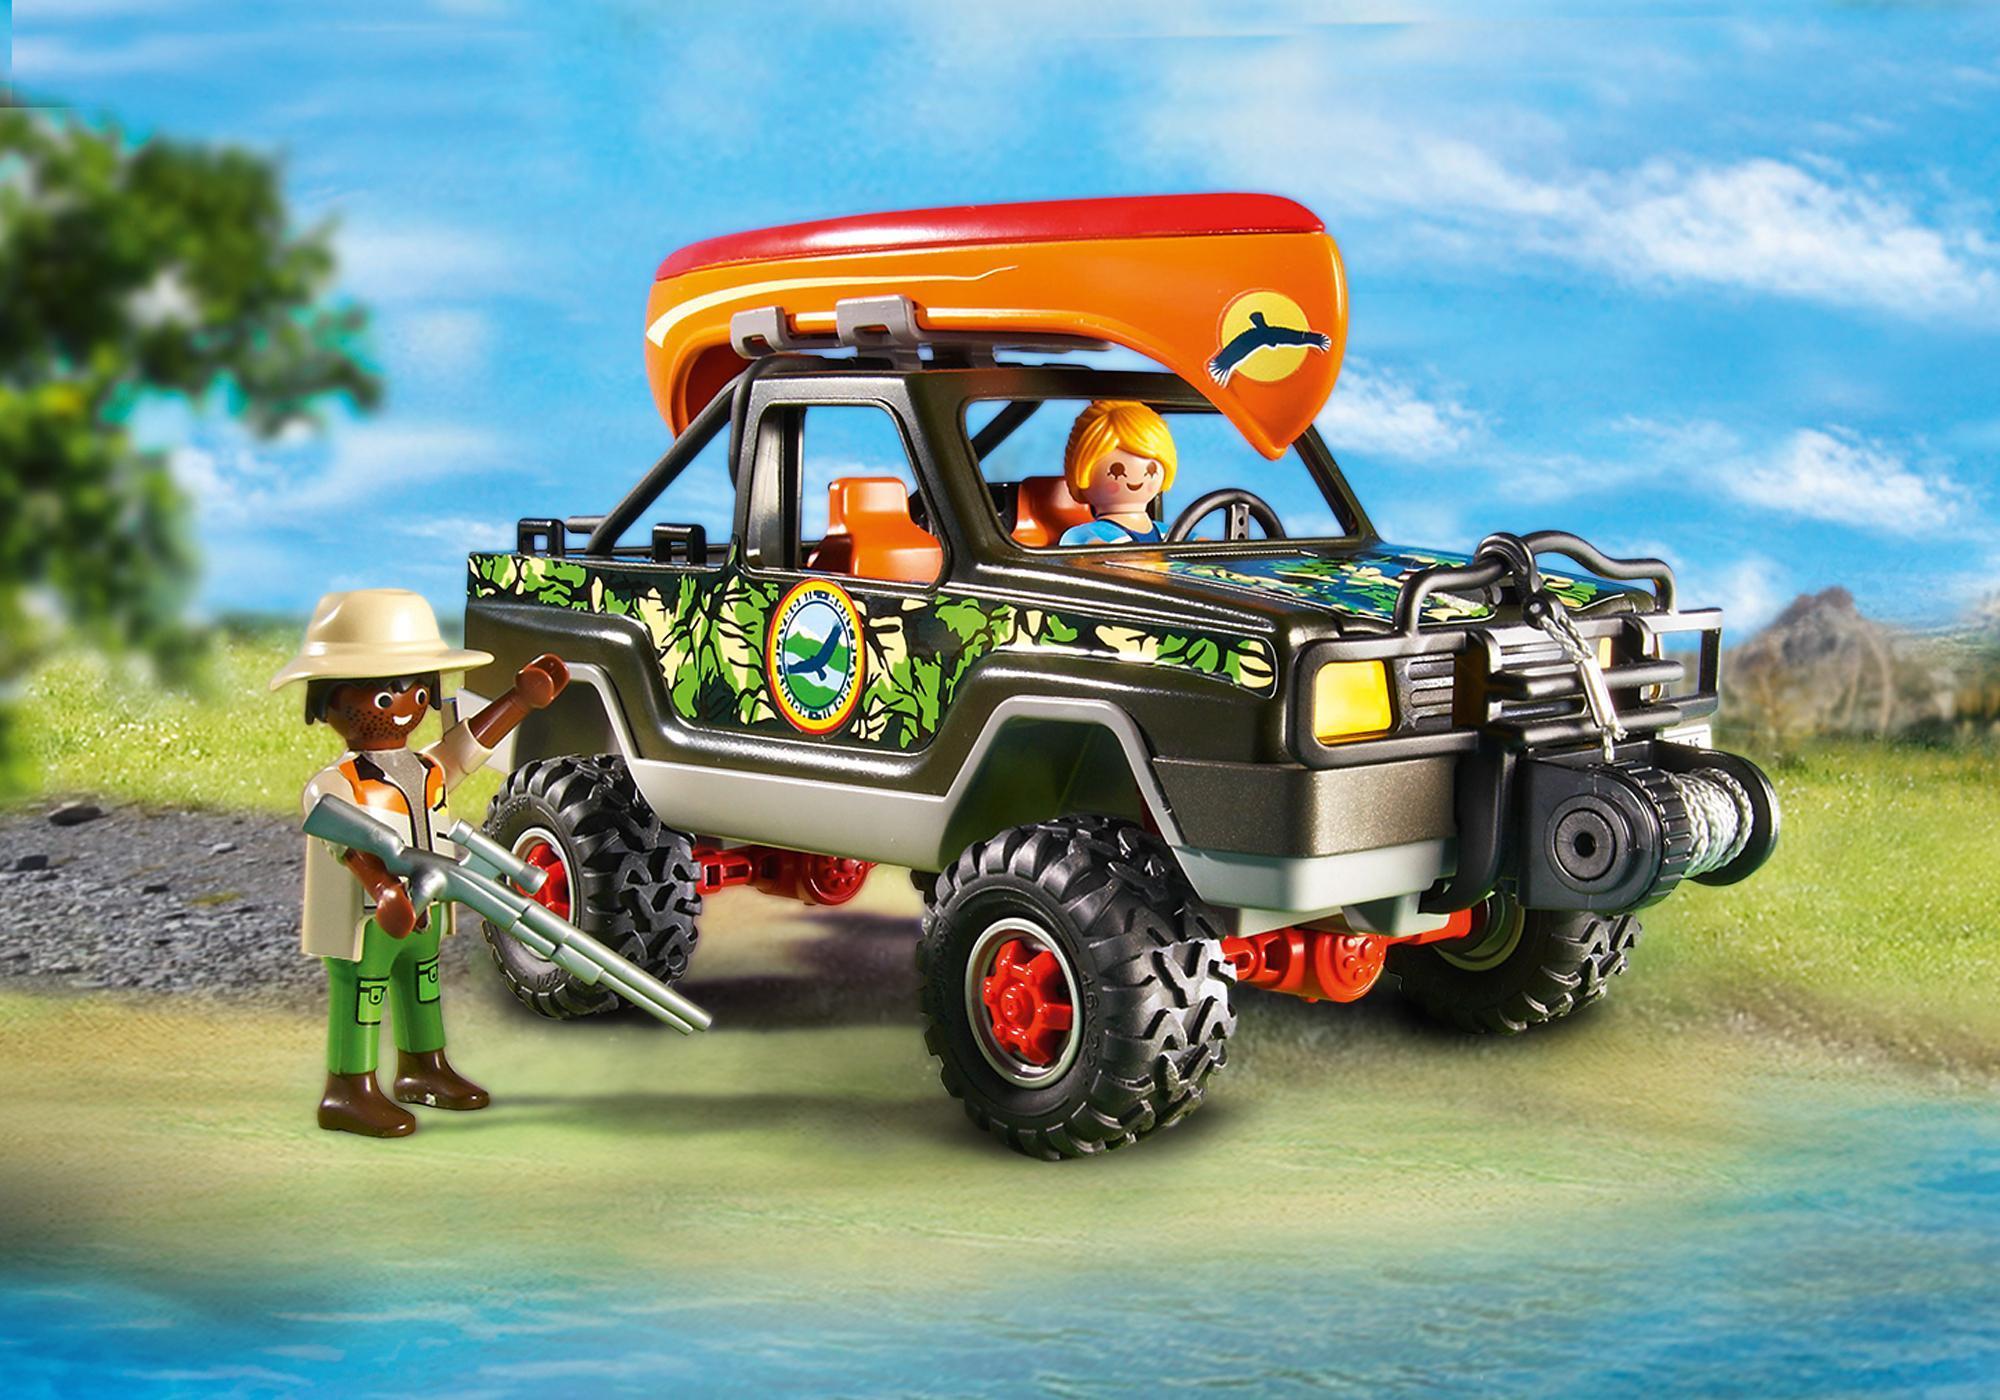 http://media.playmobil.com/i/playmobil/5558_product_extra1/Adventure Pickup Truck